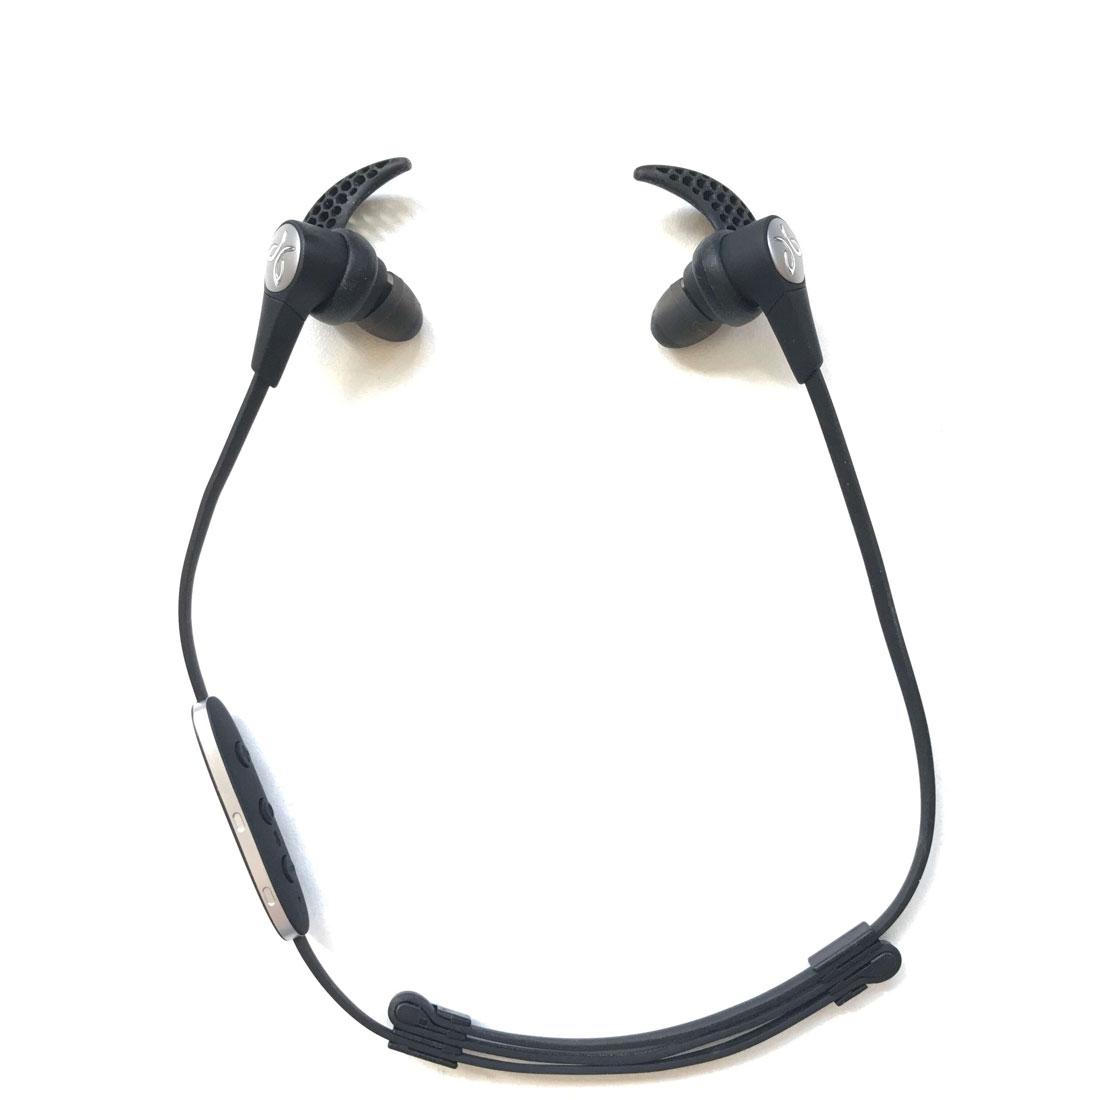 Écouteurs intras de sport sans fil Jaybird X3, 2017, Ph. Moctar KANE.